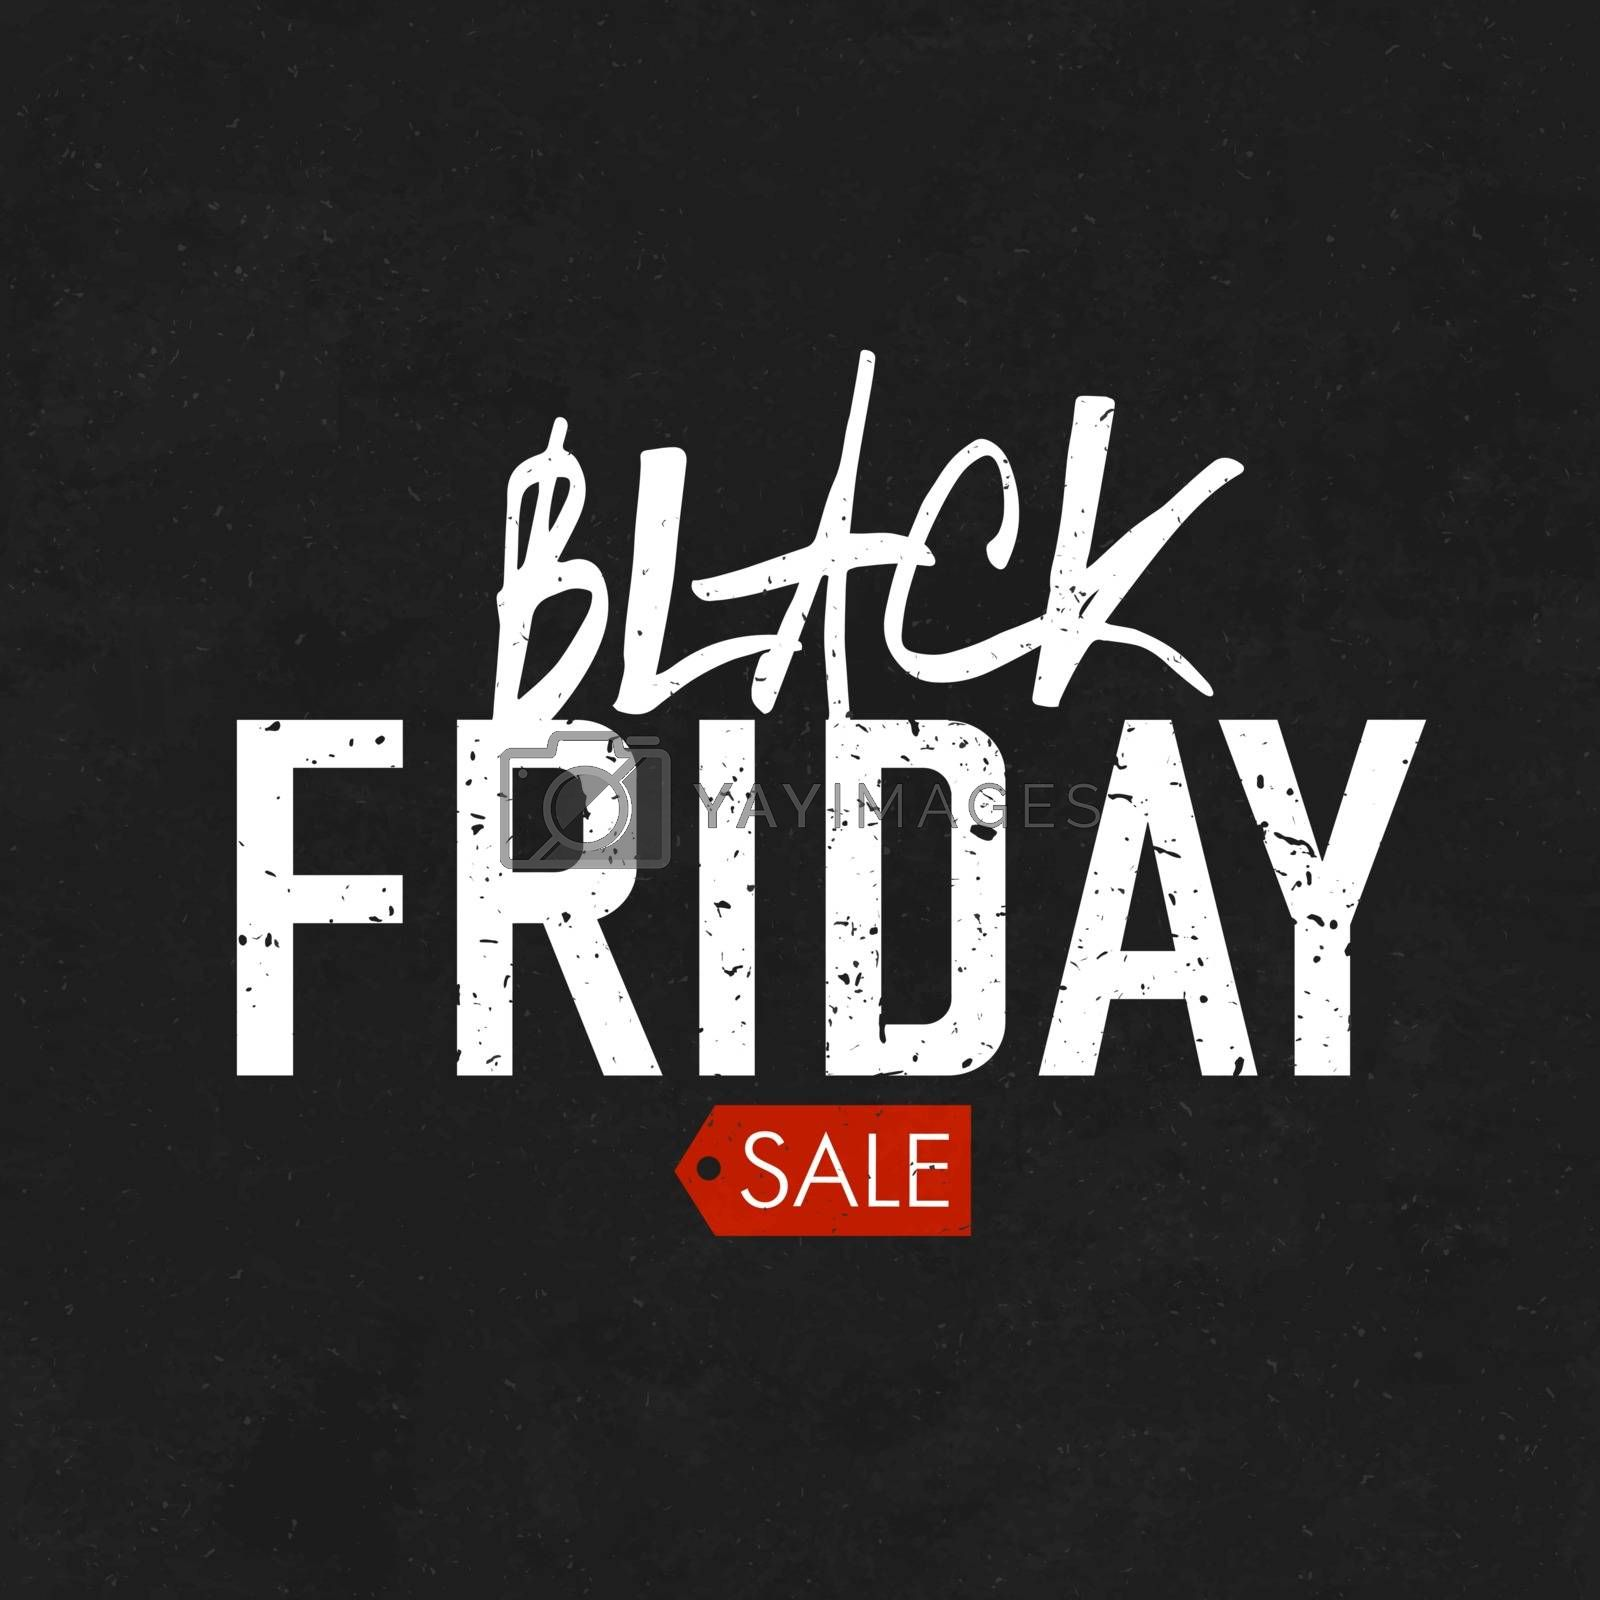 Black Friday sales Advertising Poster on Blackboard Texture